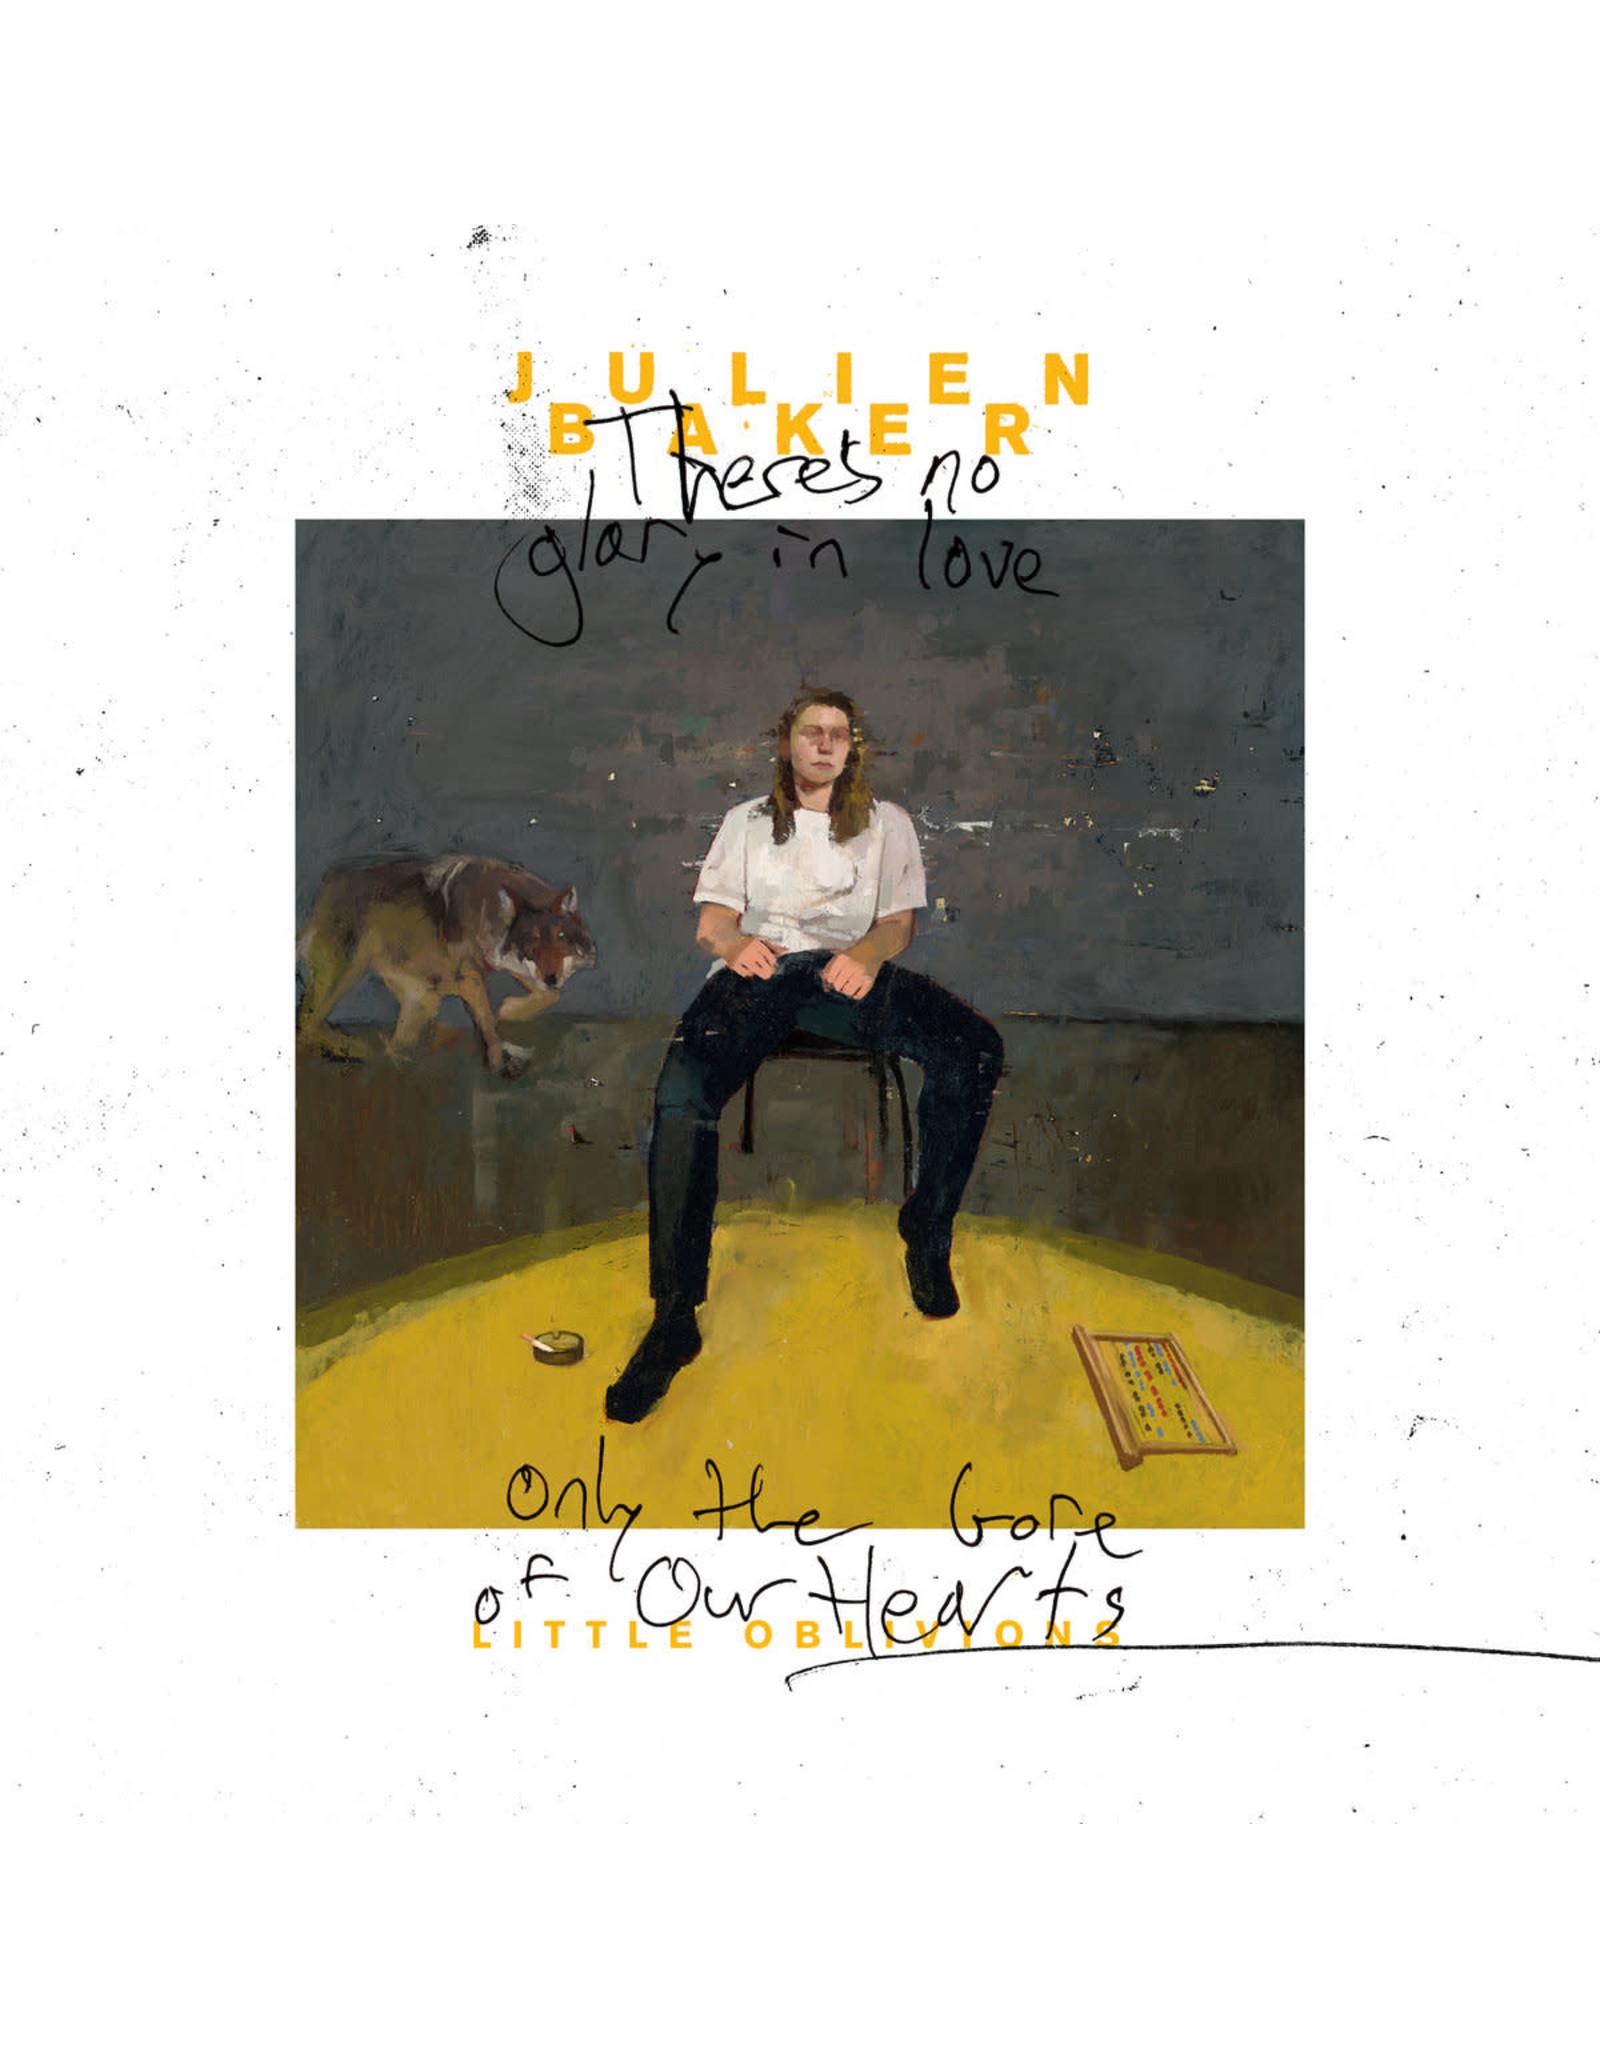 Baker, Julien - Little Oblivions LP